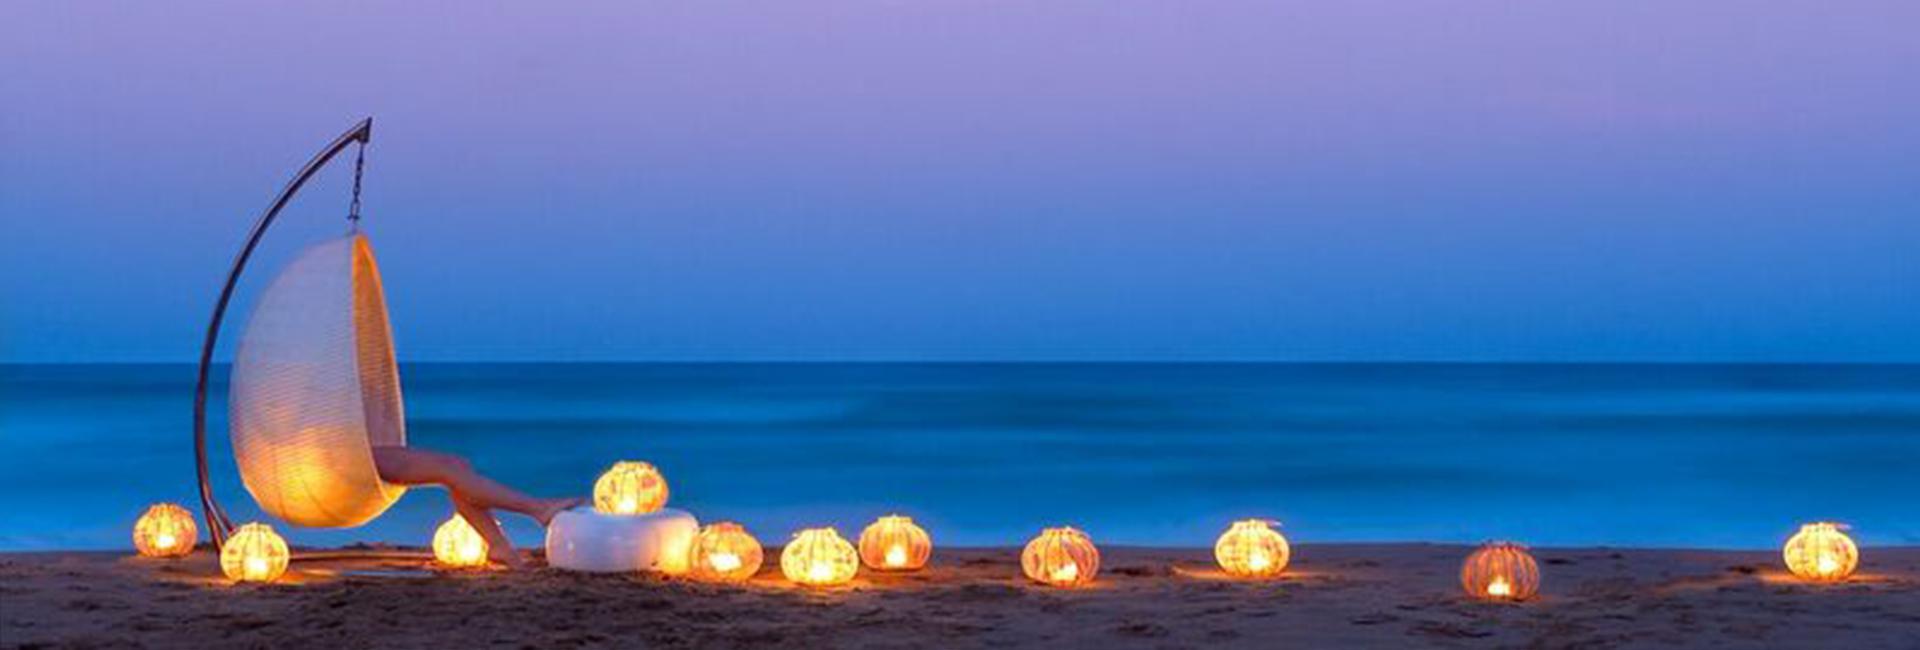 Ocean Safaris Mozambique Zanzibar Iconic Africa